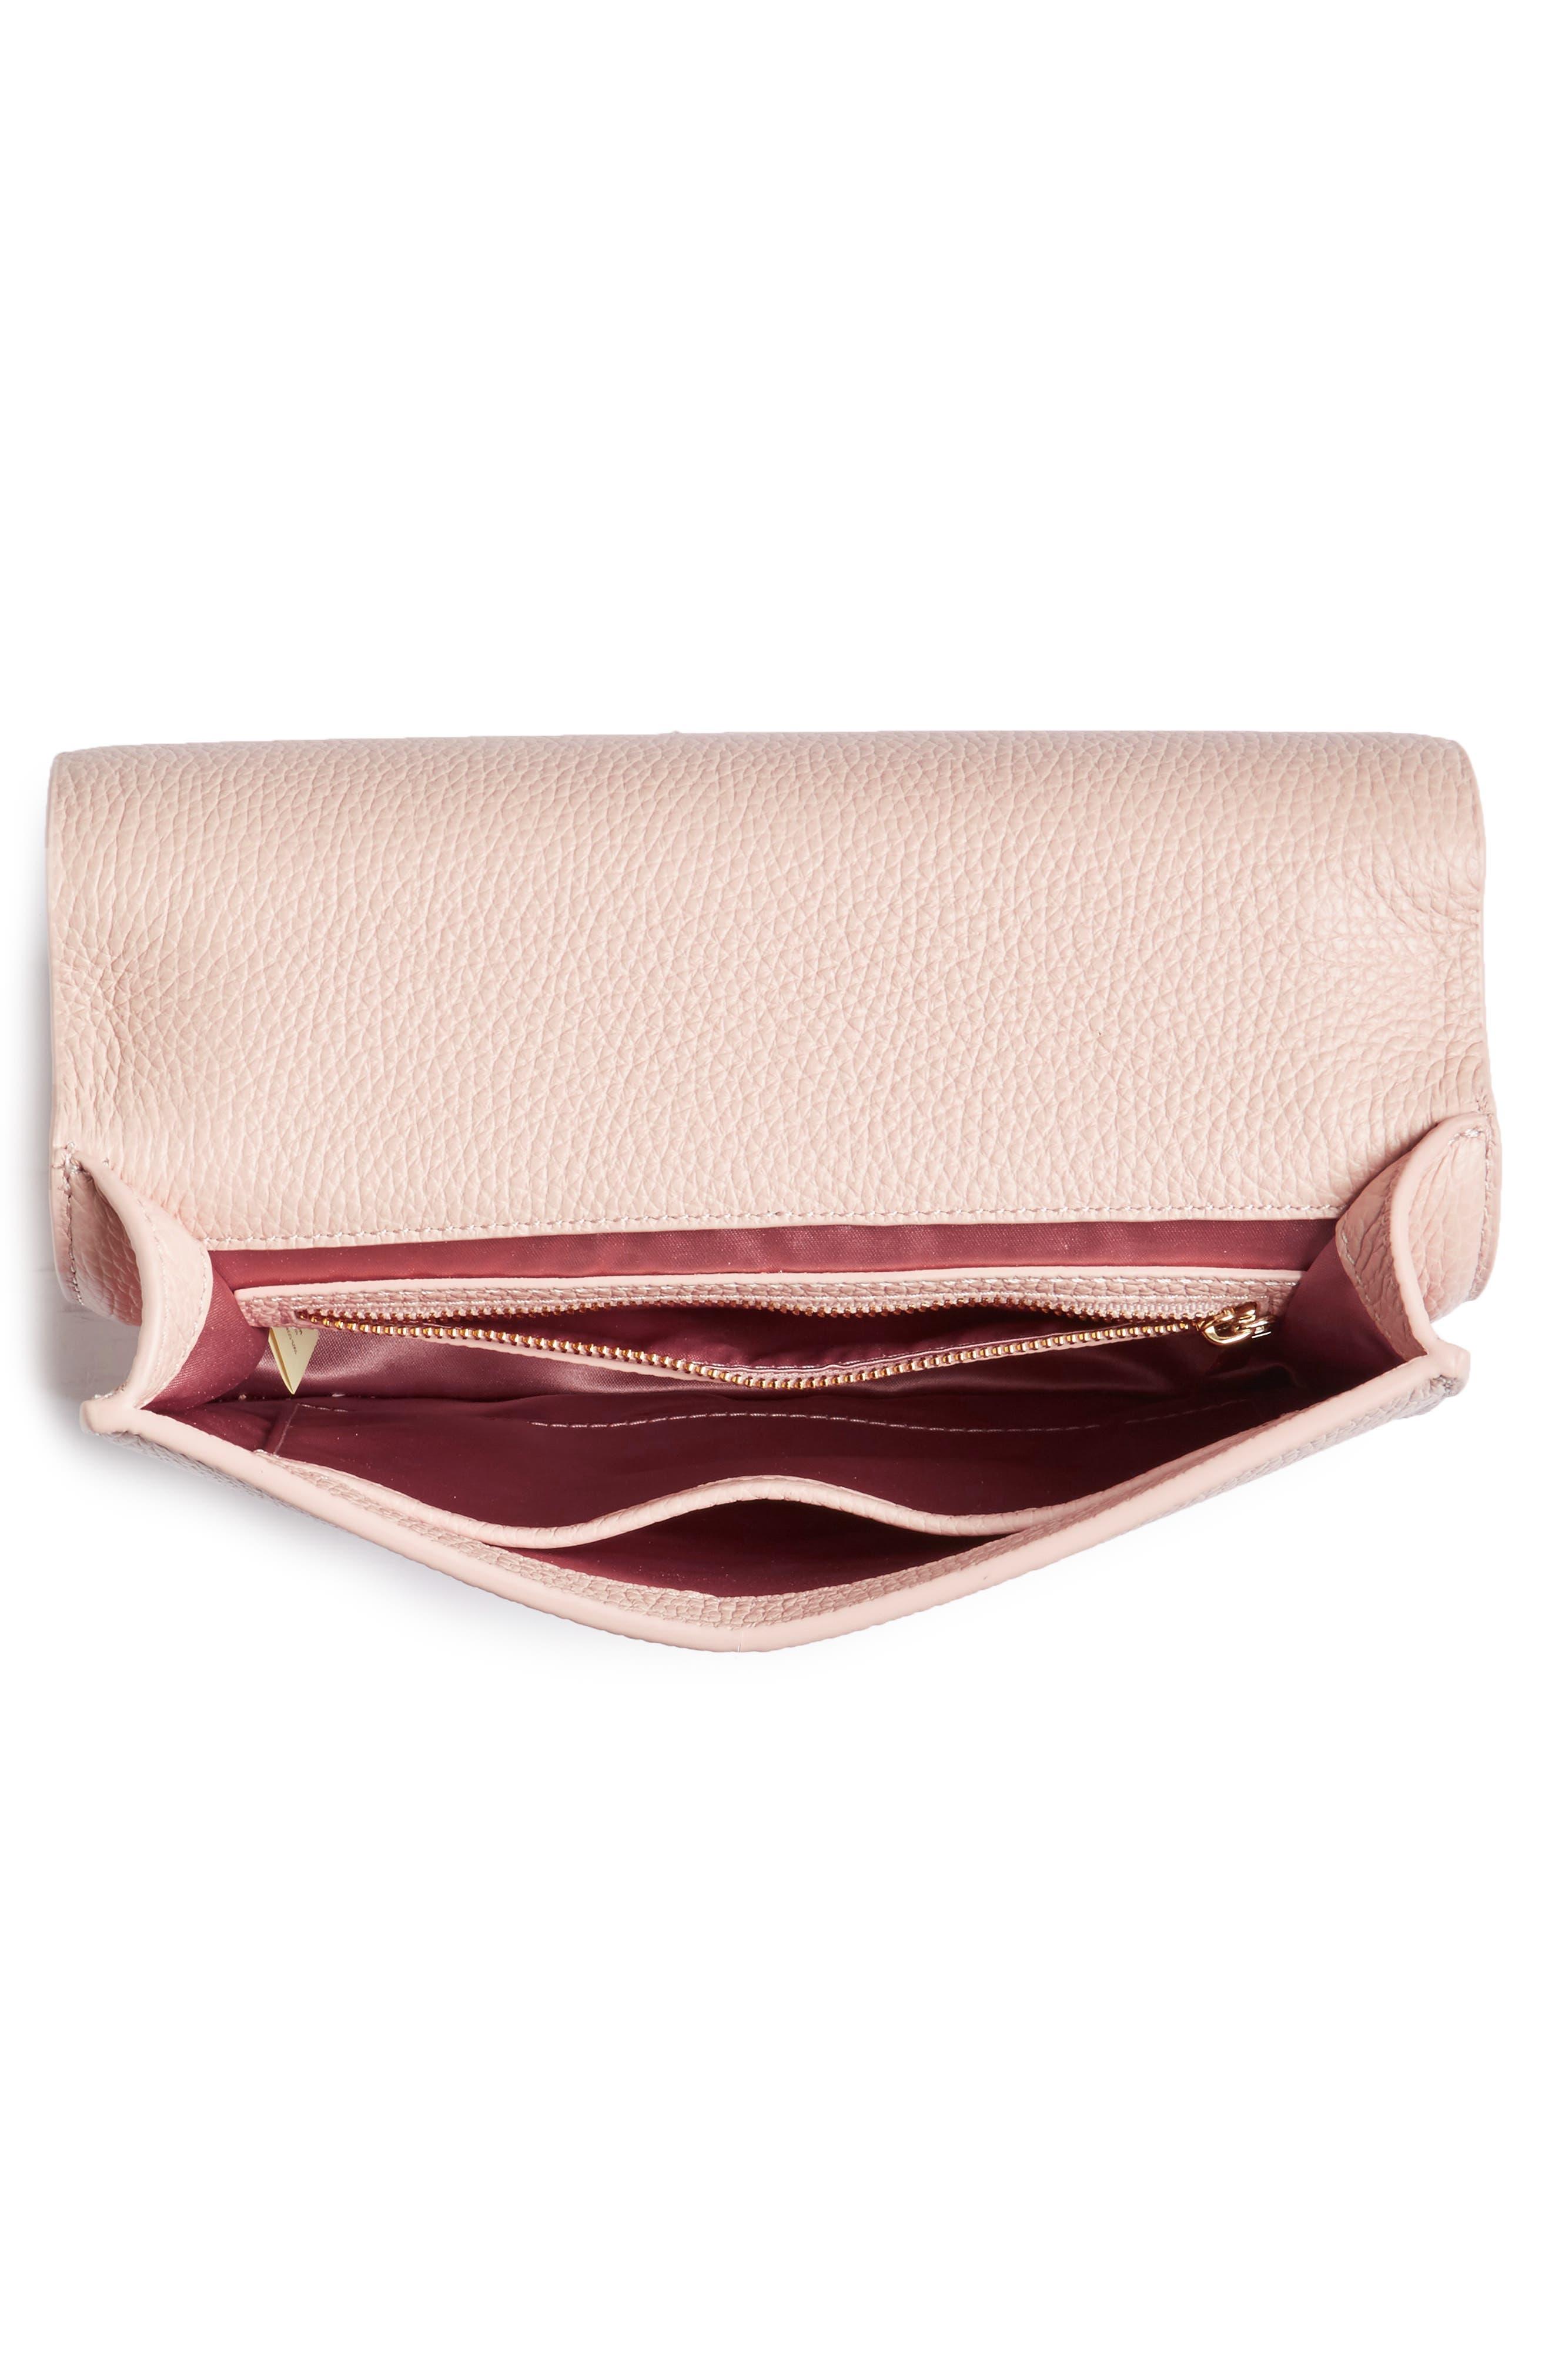 madison knollwood drive - buckle marci leather shoulder bag,                             Alternate thumbnail 8, color,